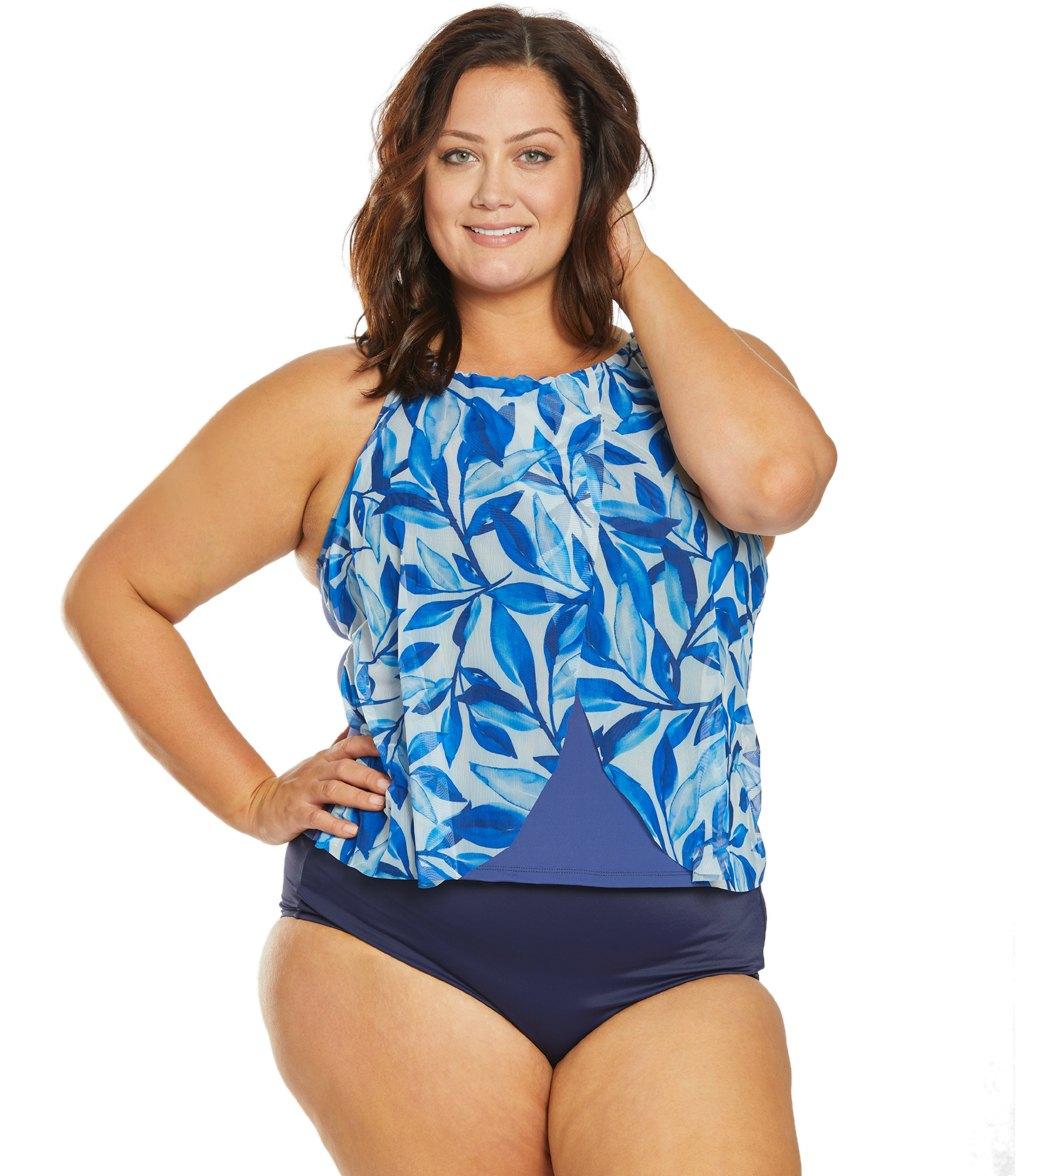 9a1b834c33 24th & Ocean Plus Size Laila Leaf Flounce Mesh Tankini Top at  SwimOutlet.com - Free Shipping